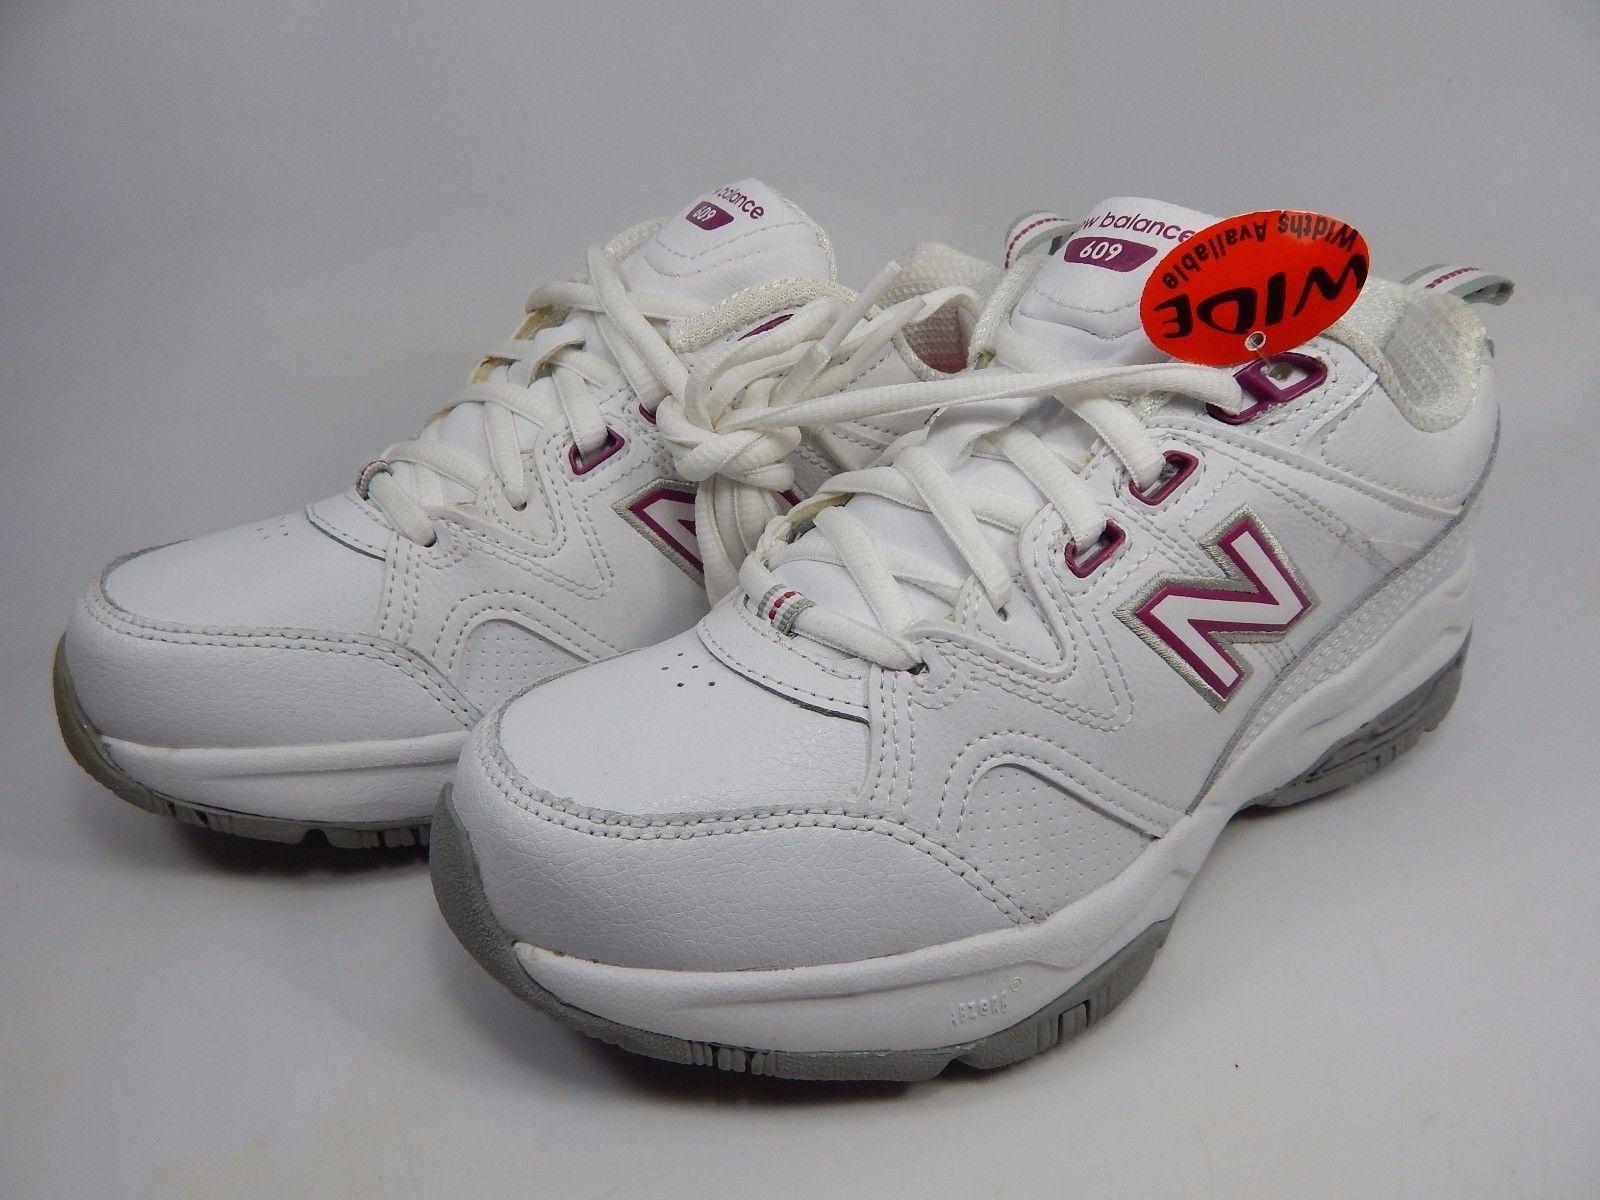 New Balance 609 v2 Women's Training Shoes Sz US 6 D WIDE EU 36.5 White WX609CY2